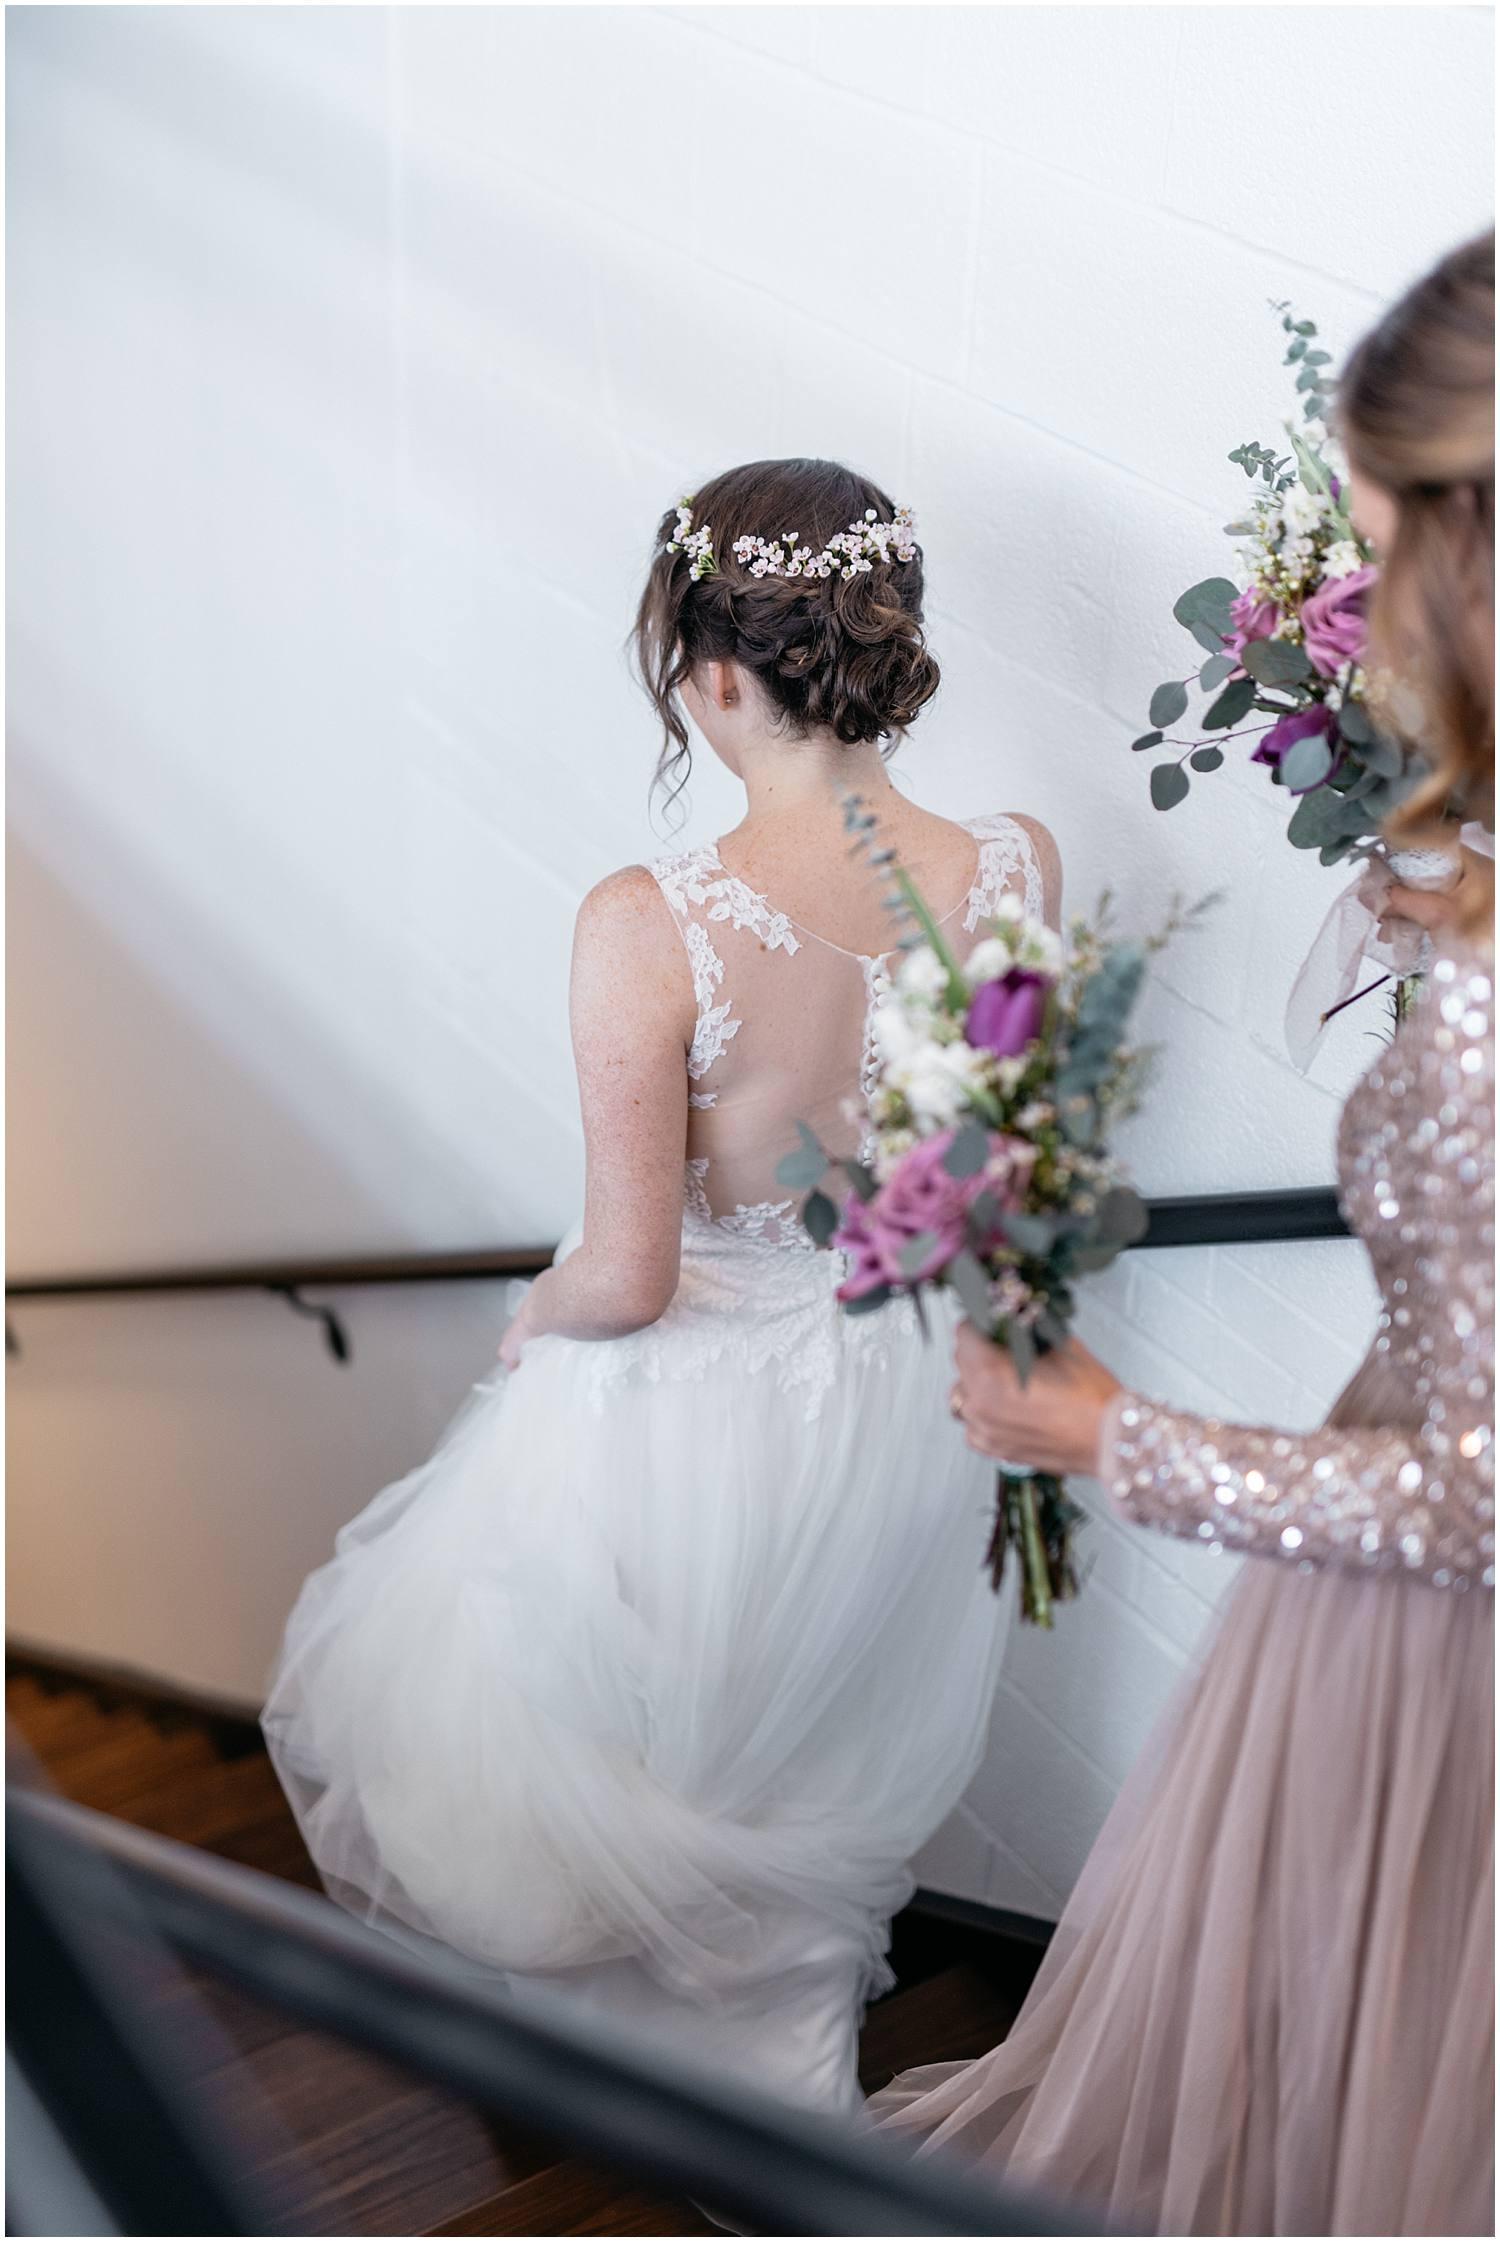 Josh - Emily - wedding - supply manheim- www.gabemcmullen.com27.jpg